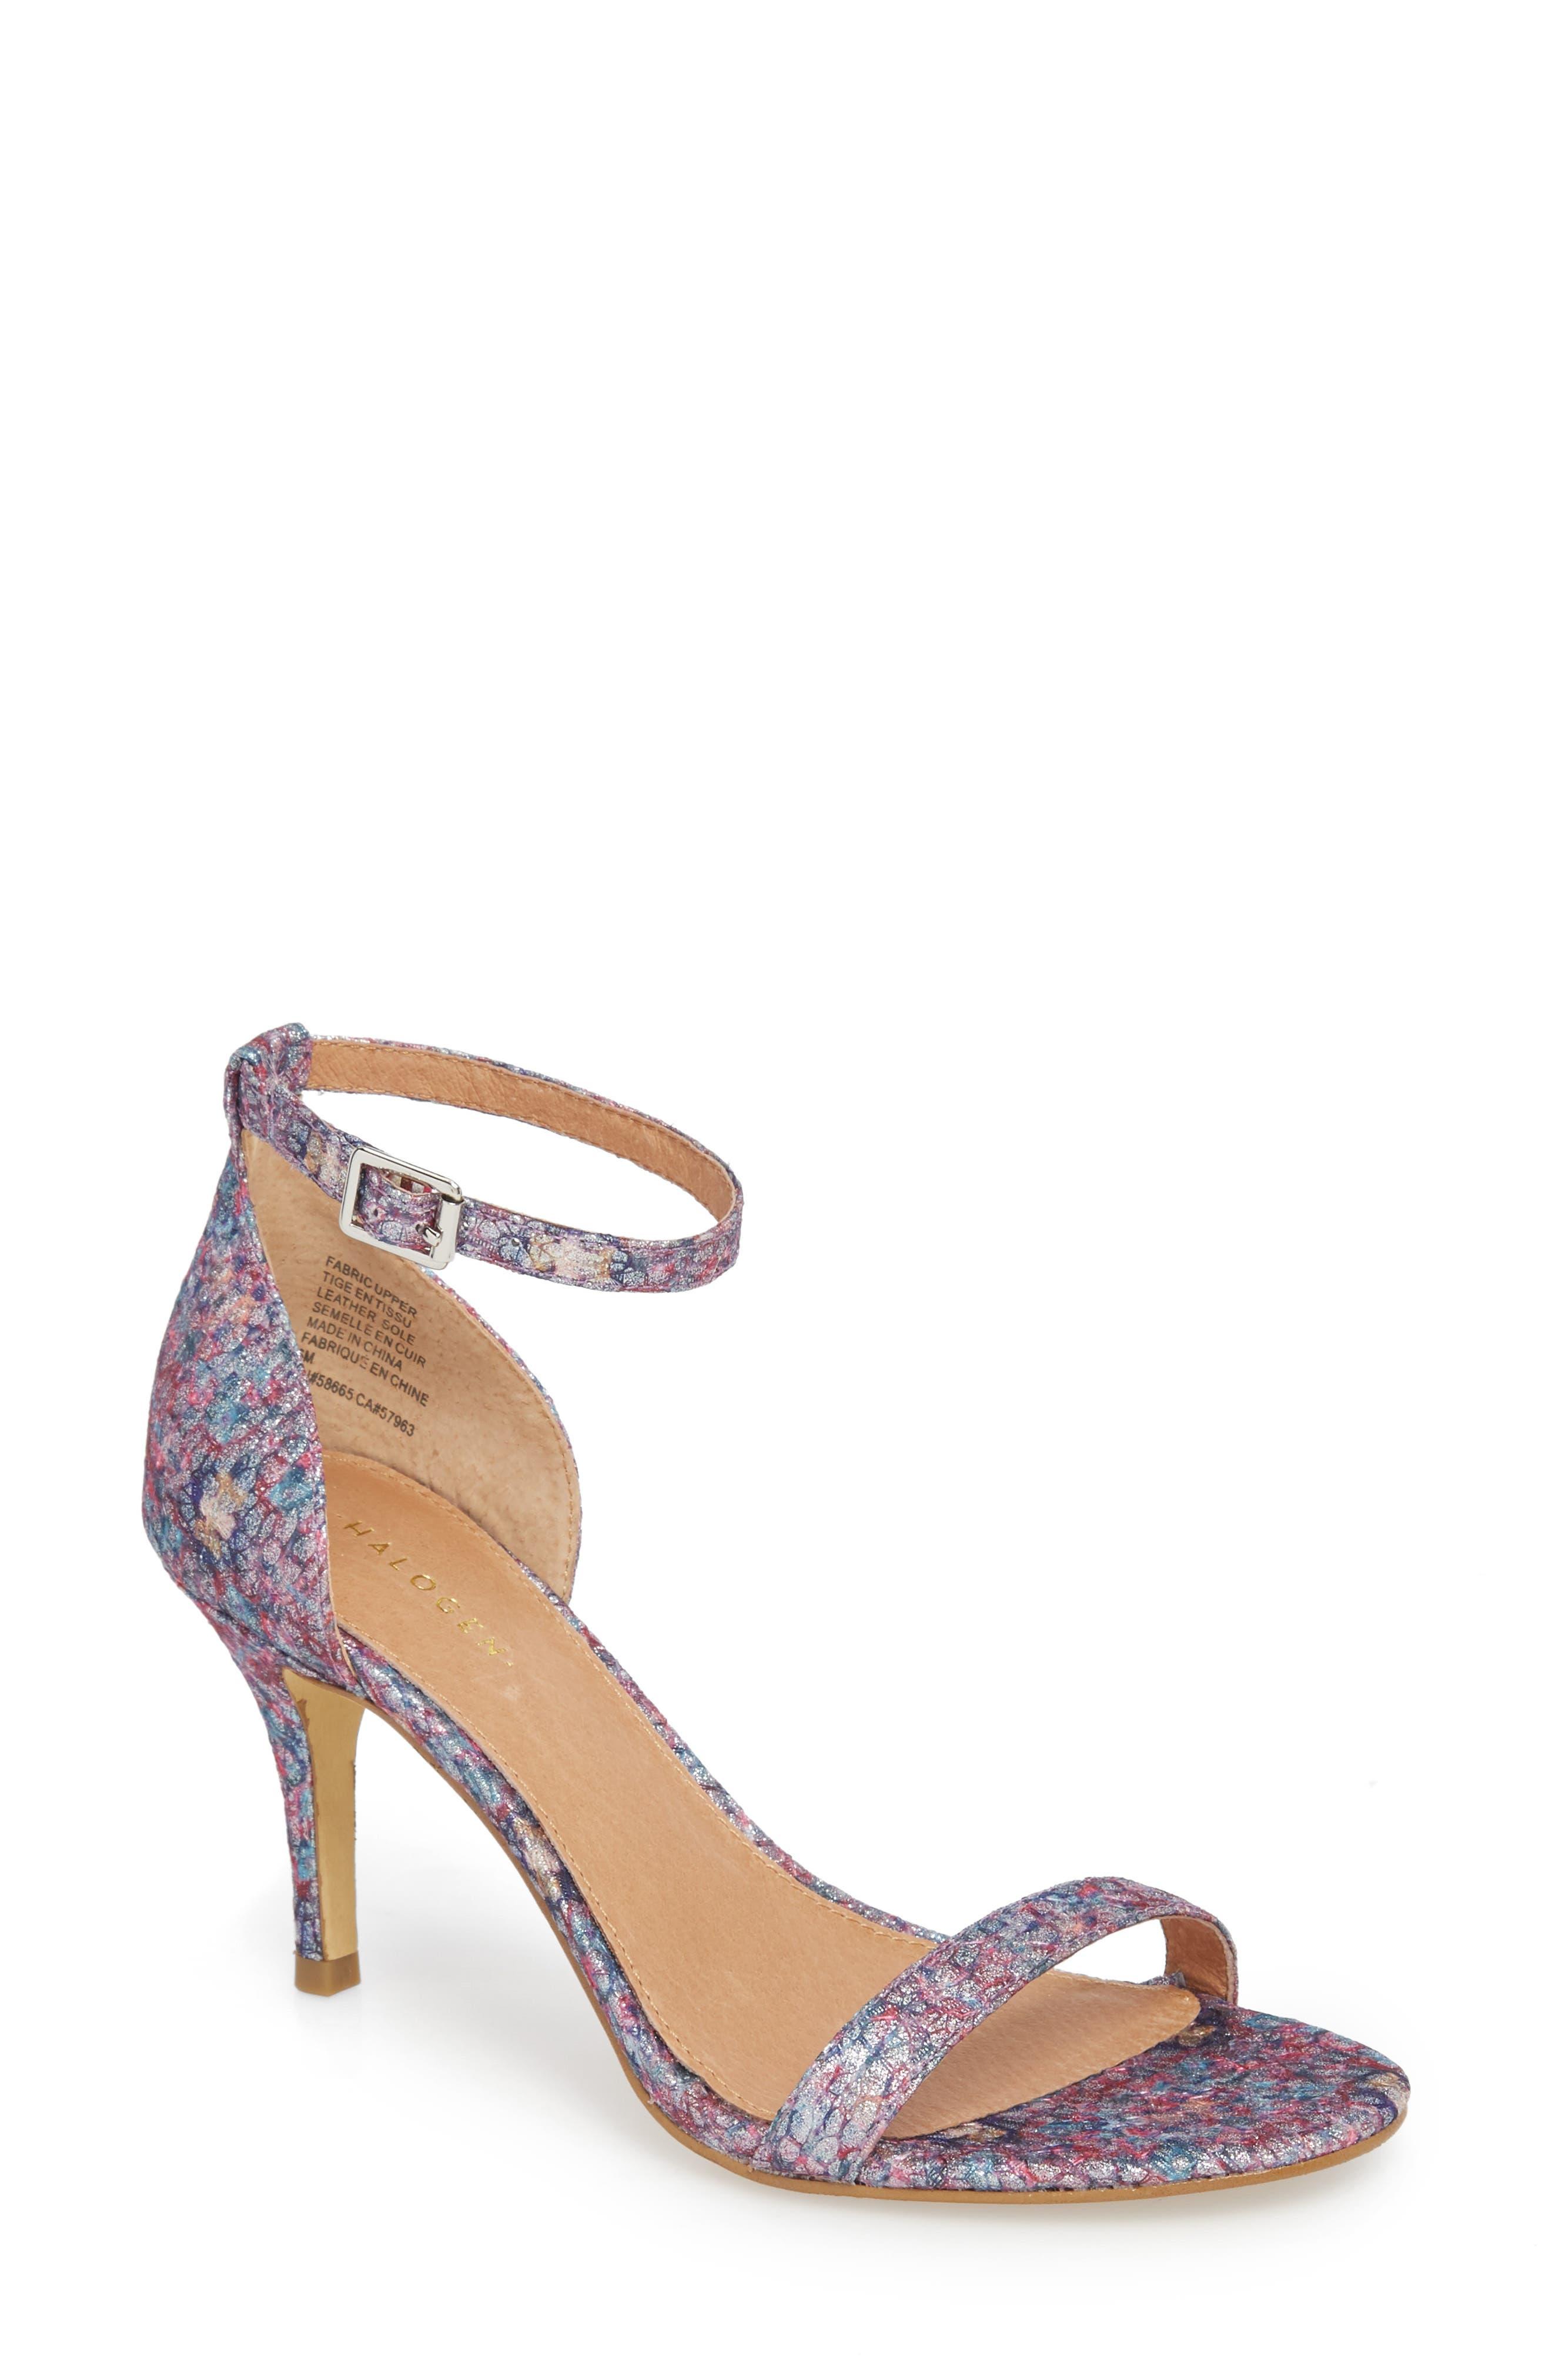 Audrey Ankle Strap Sandal,                             Main thumbnail 1, color,                             Bright Confetti Fabric